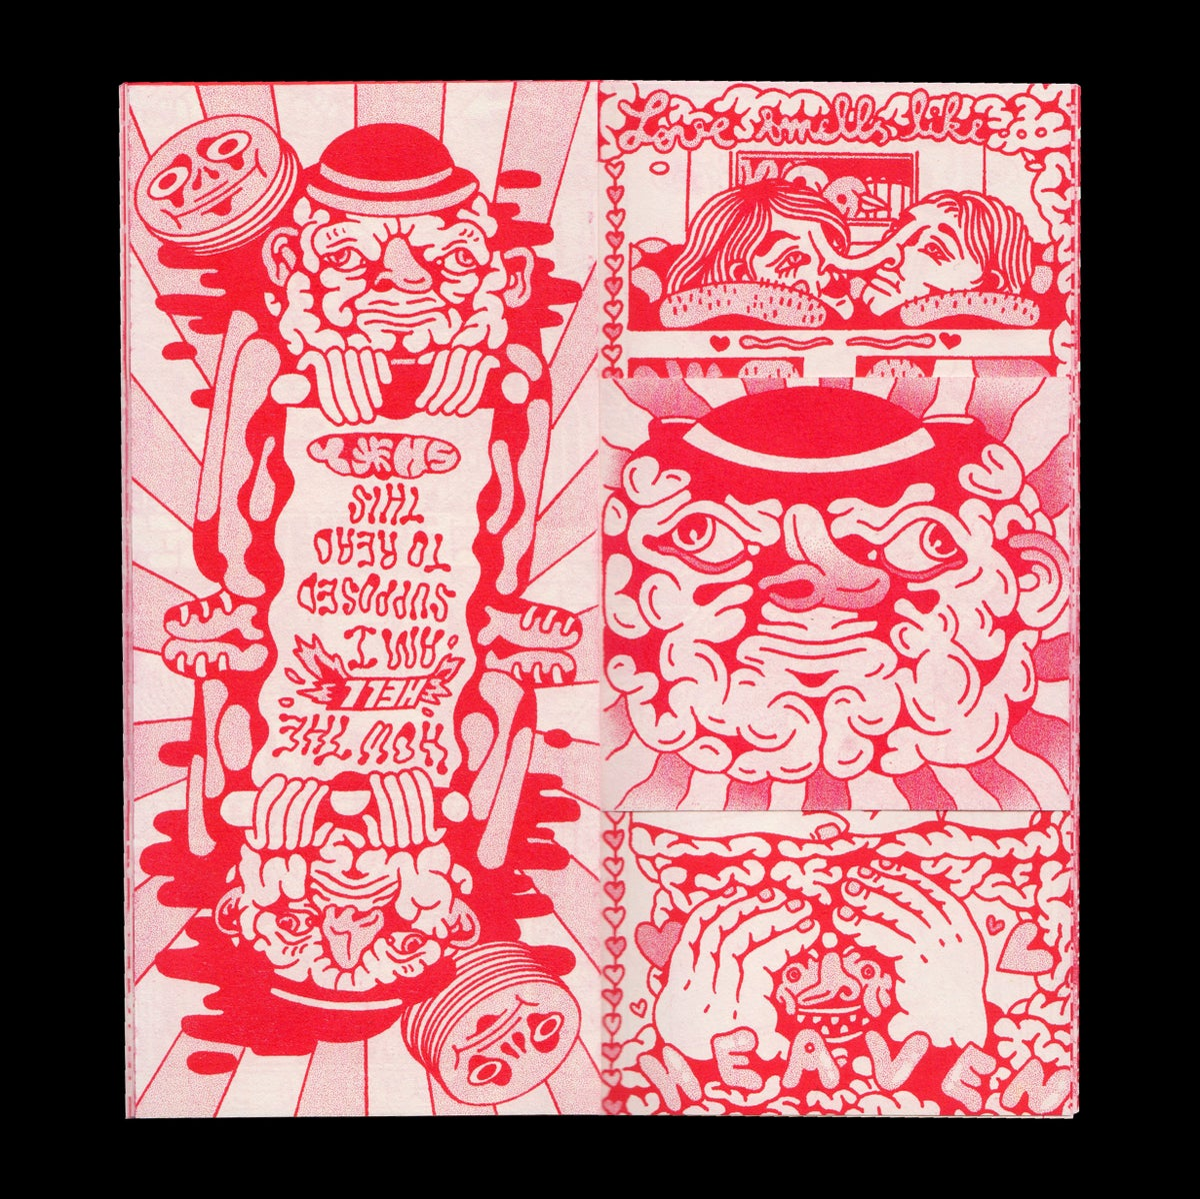 Image of La Vie 100 Soucis RED Edition